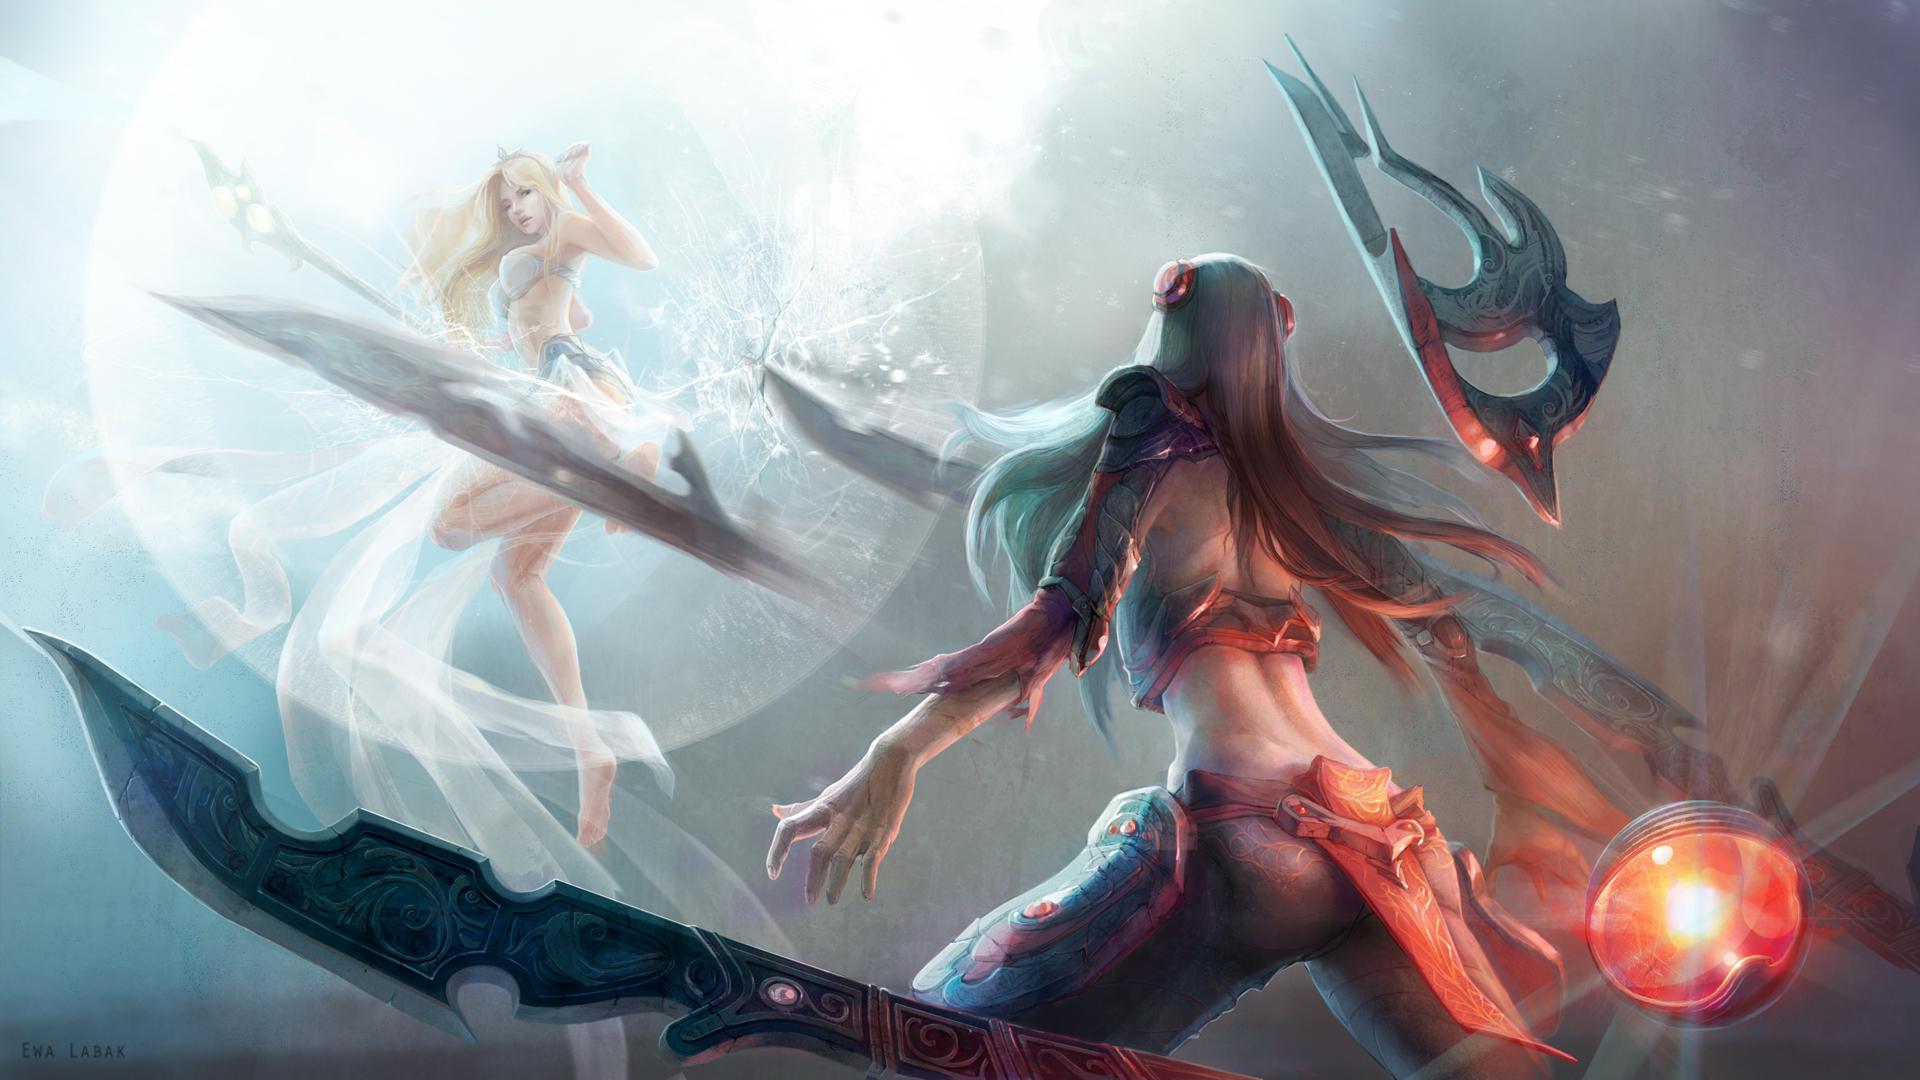 League of Legends - Irelia vs. Janna by EwaLabak